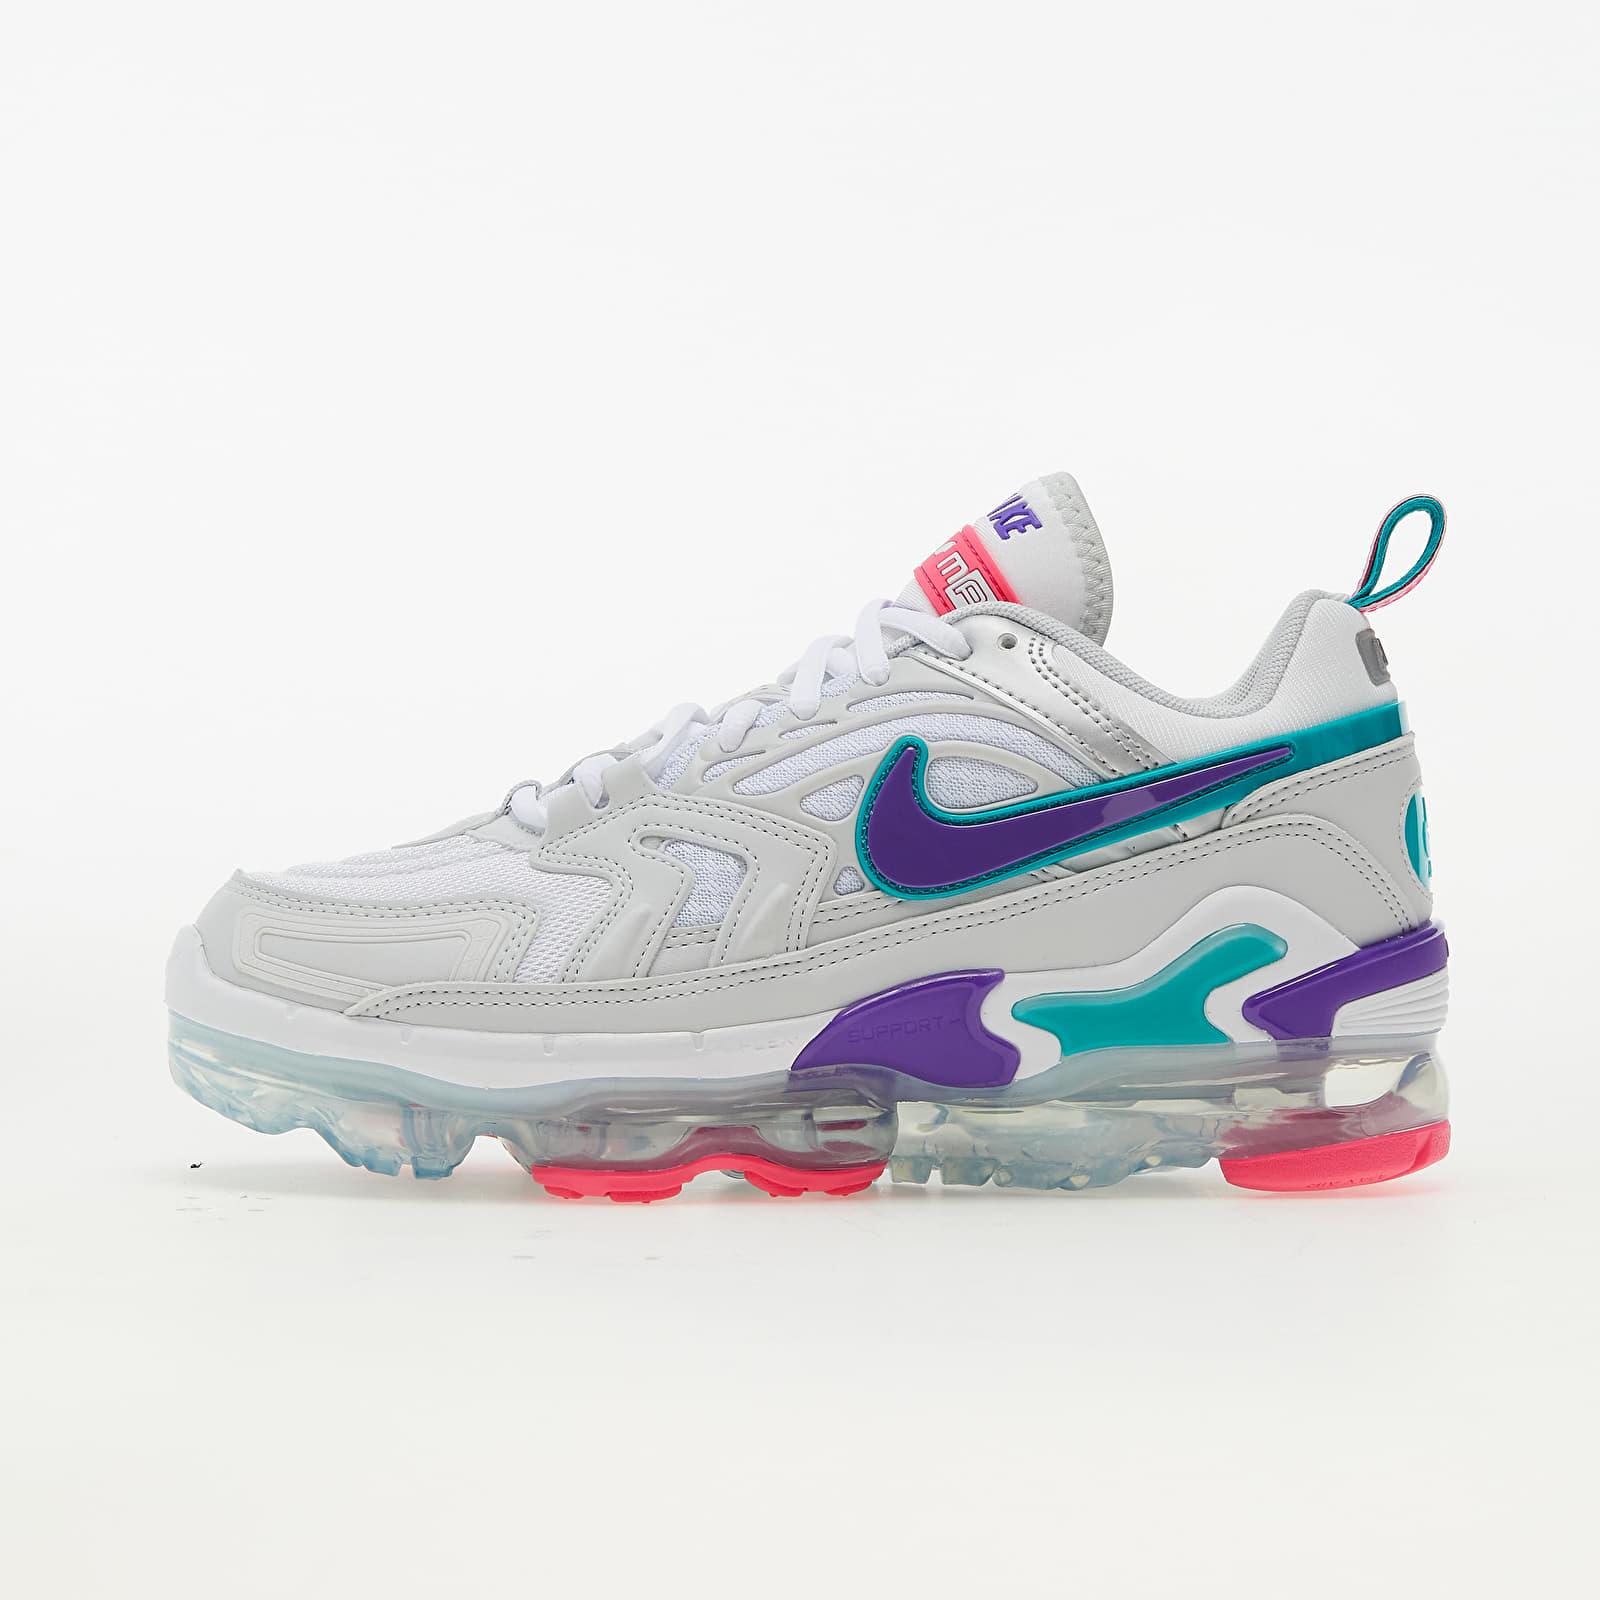 Nike W Air Vapormax Evo Photon Dust/ Hyper Grape-White-Hyper Pink EUR 38.5